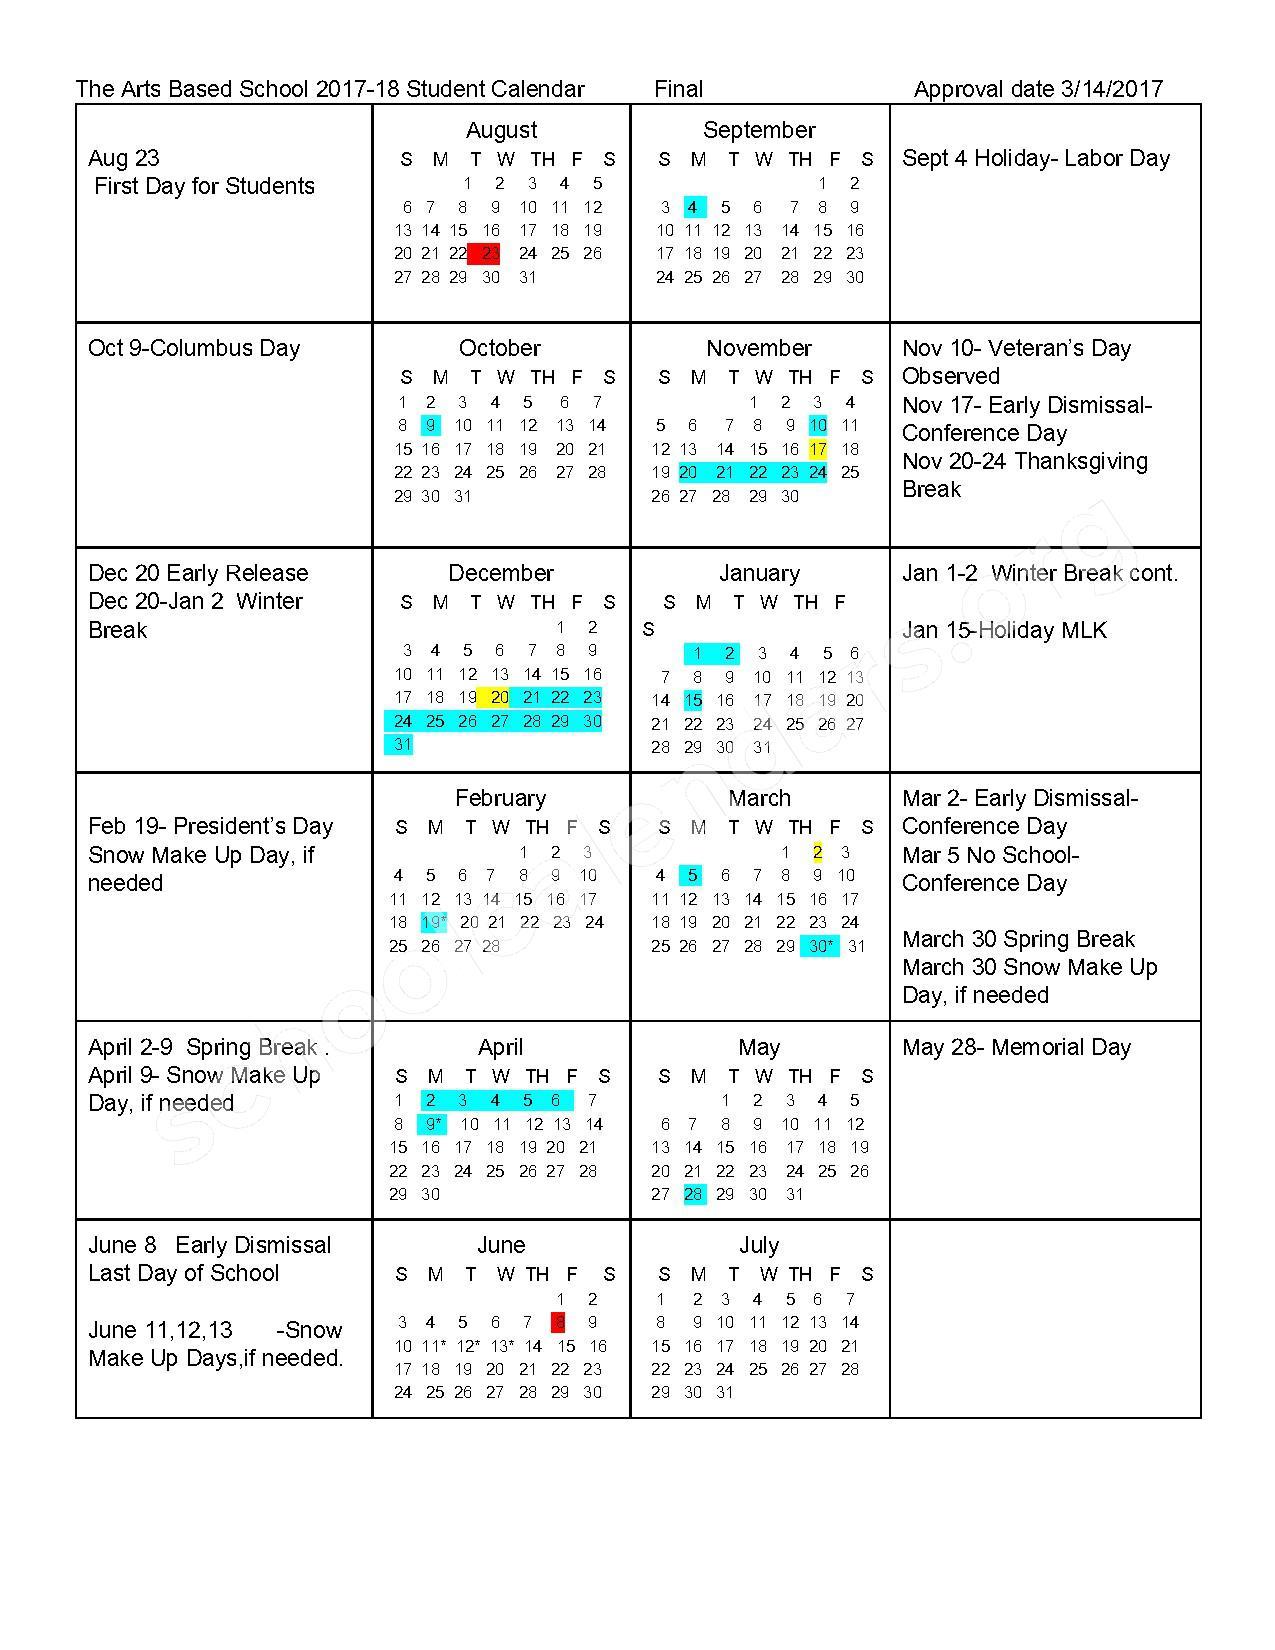 2017 - 2018 School Calendar – Arts Based Elementary – page 1